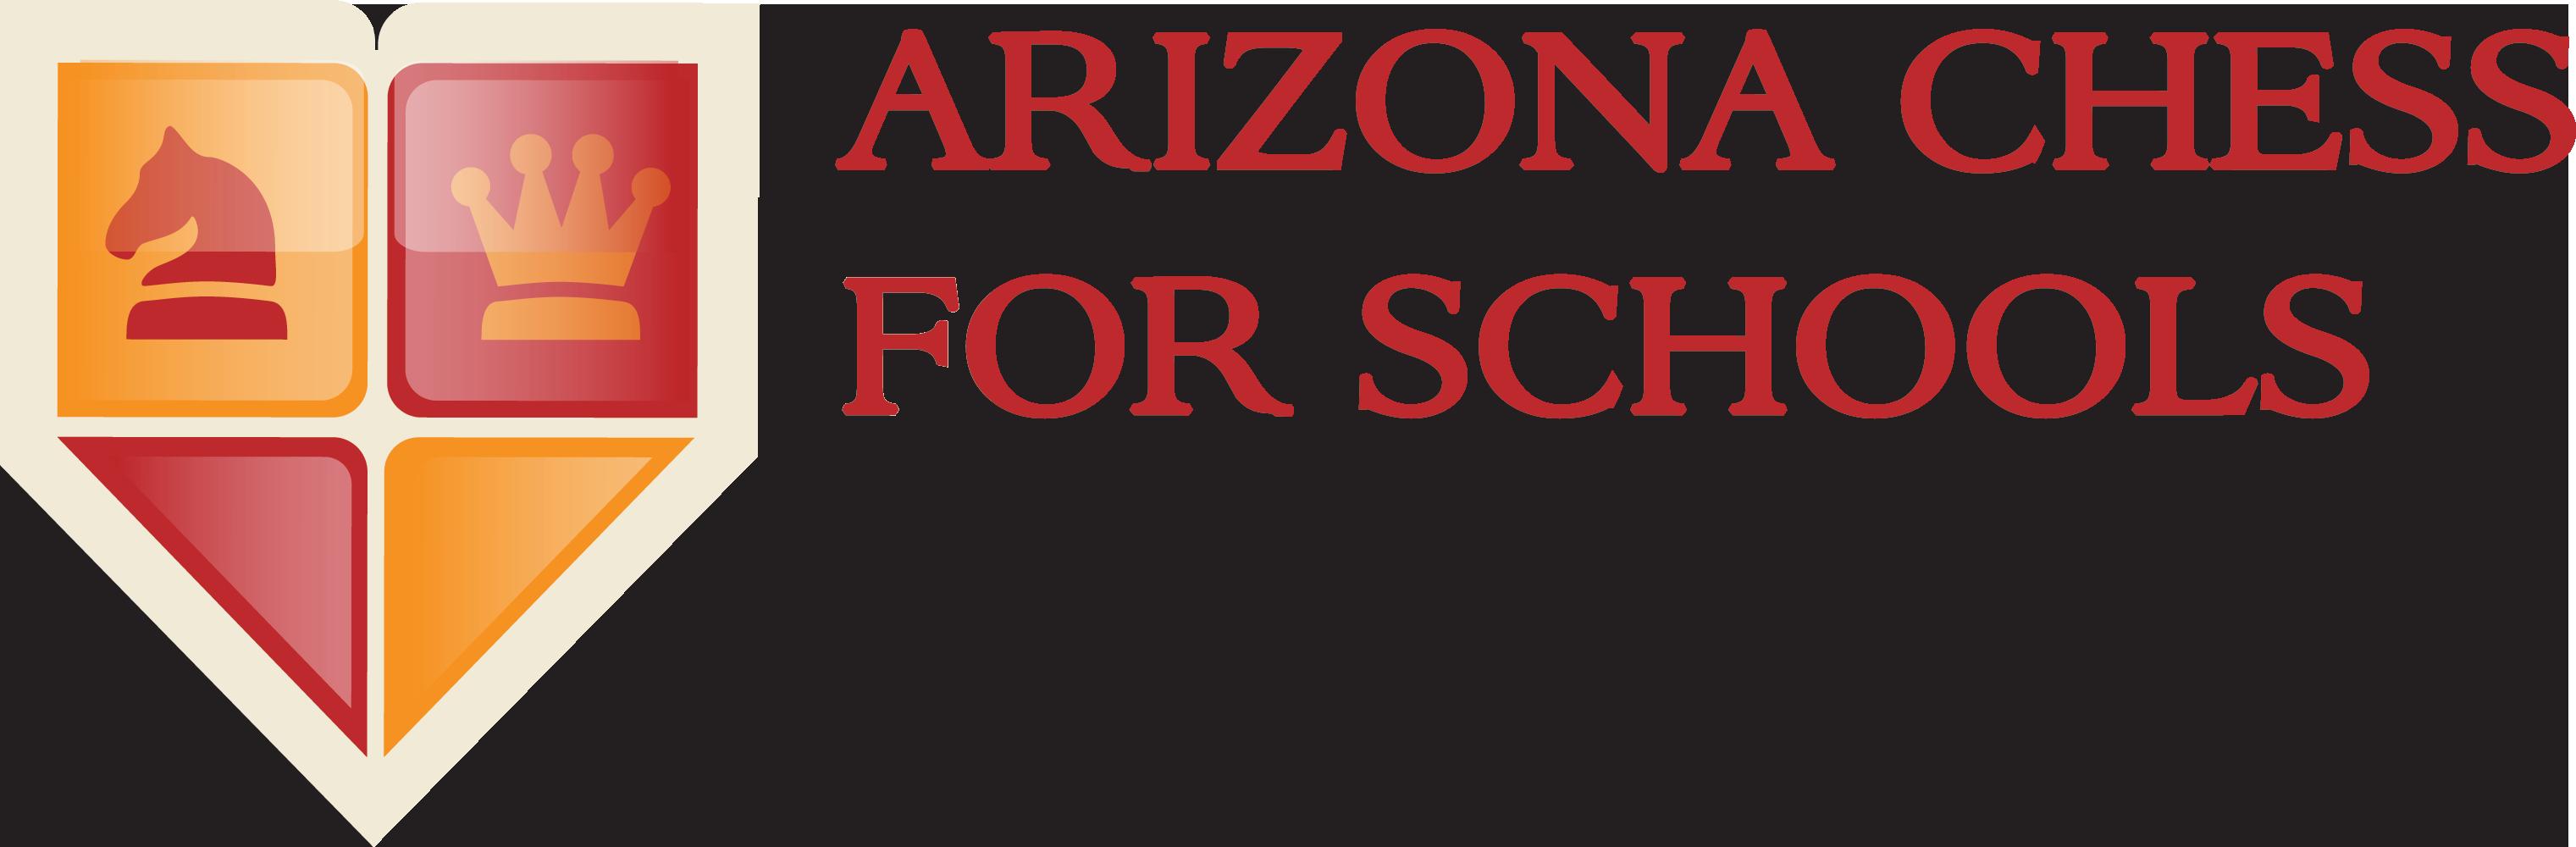 Arizona Chess for Schools